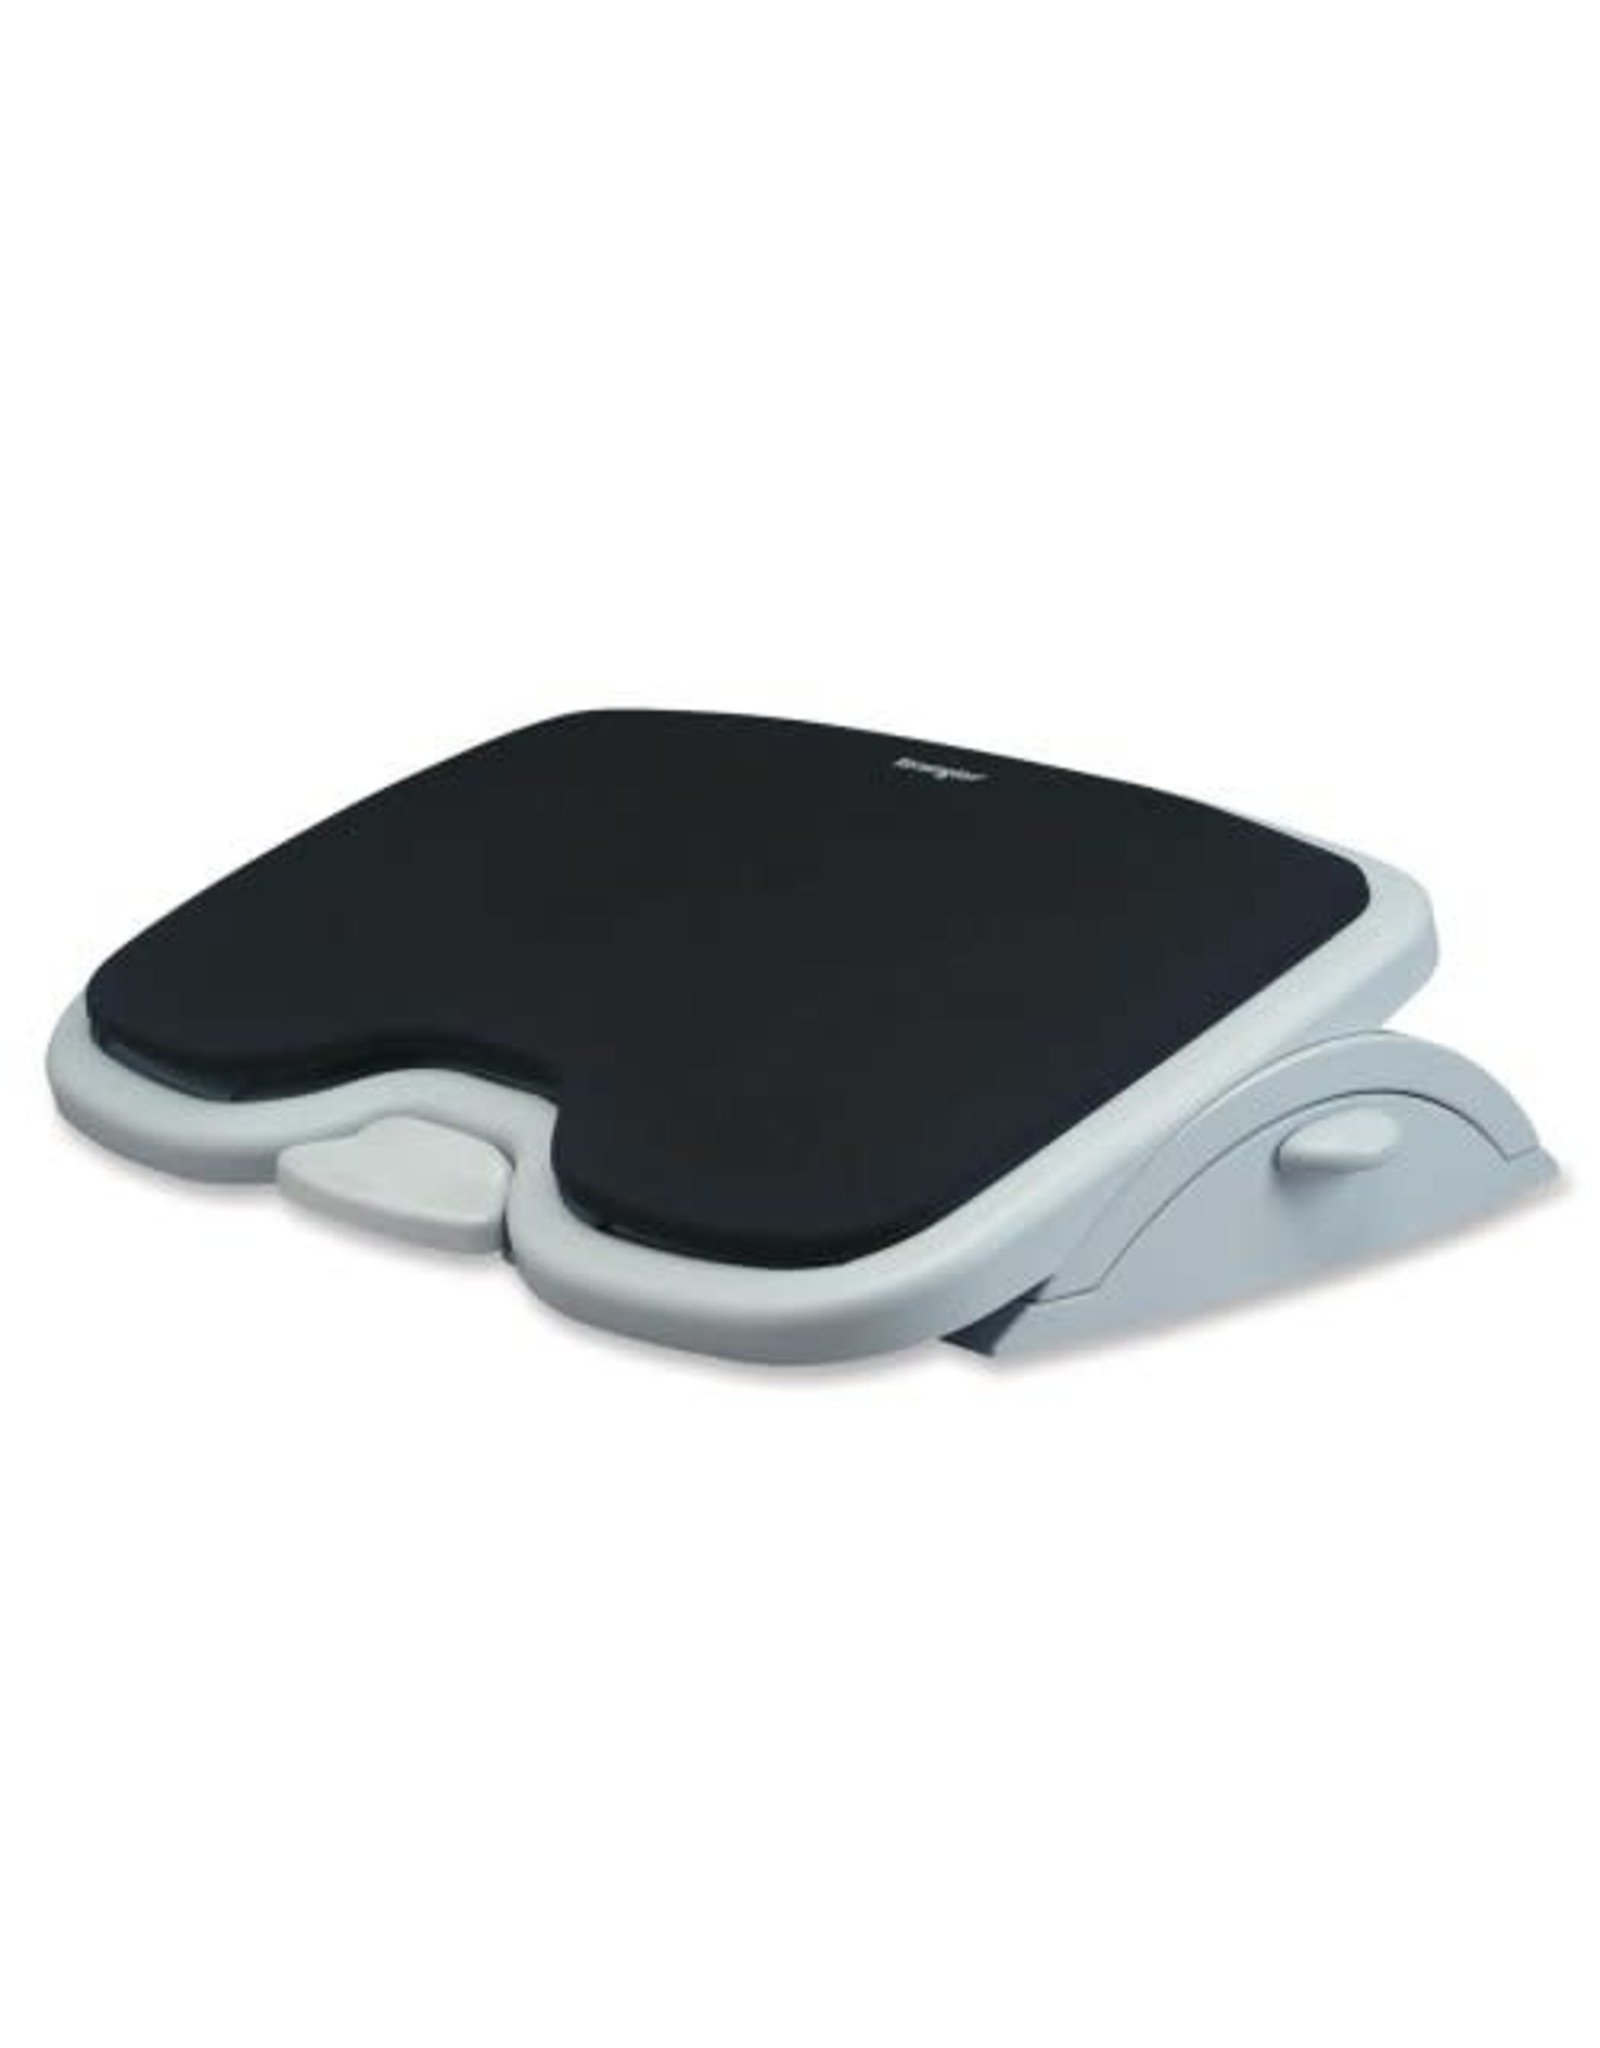 Kensington Kensington Ergonomic Footrest SoleMate Comfort Adjustable  SKU:50050